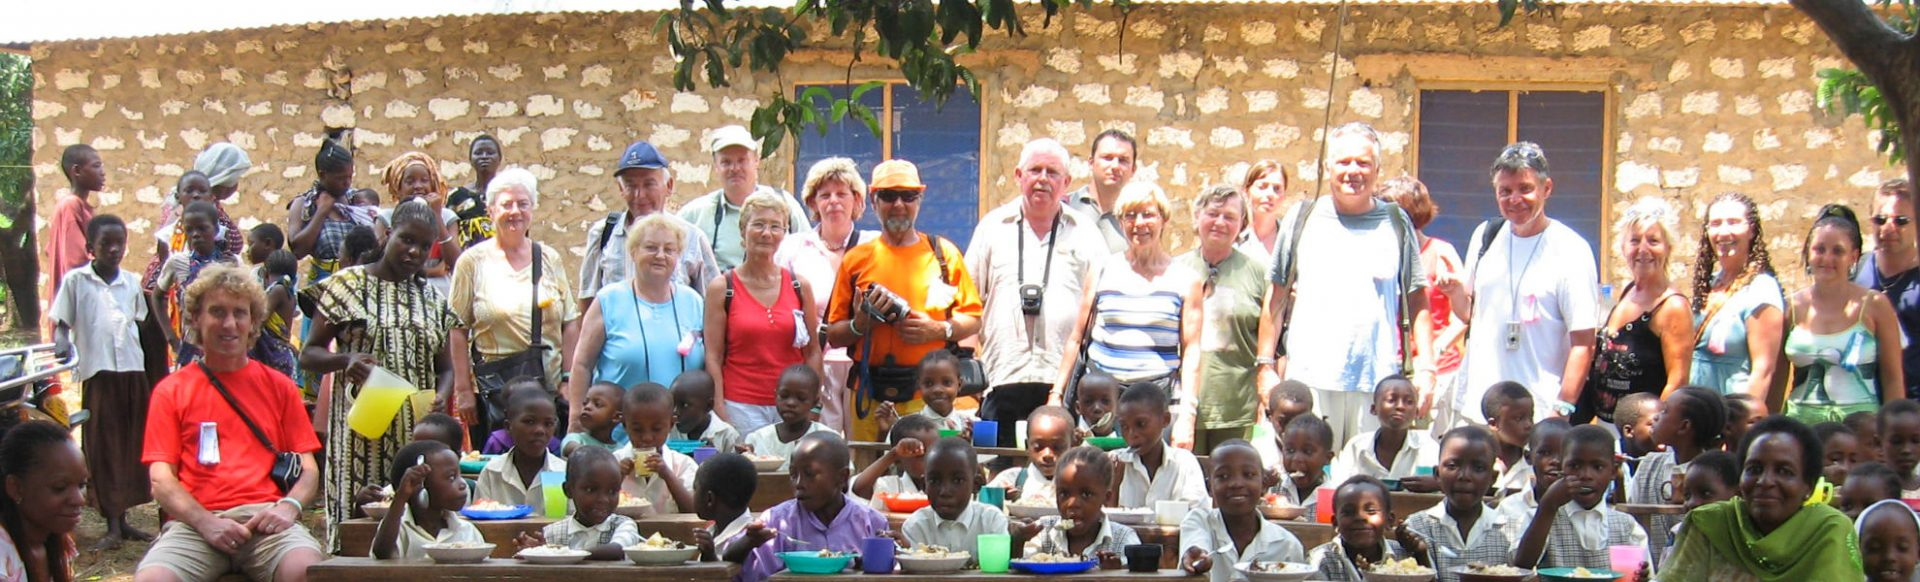 Pateneltern besuchen Reisekontor Schmidt Schulprojekt in Kenia